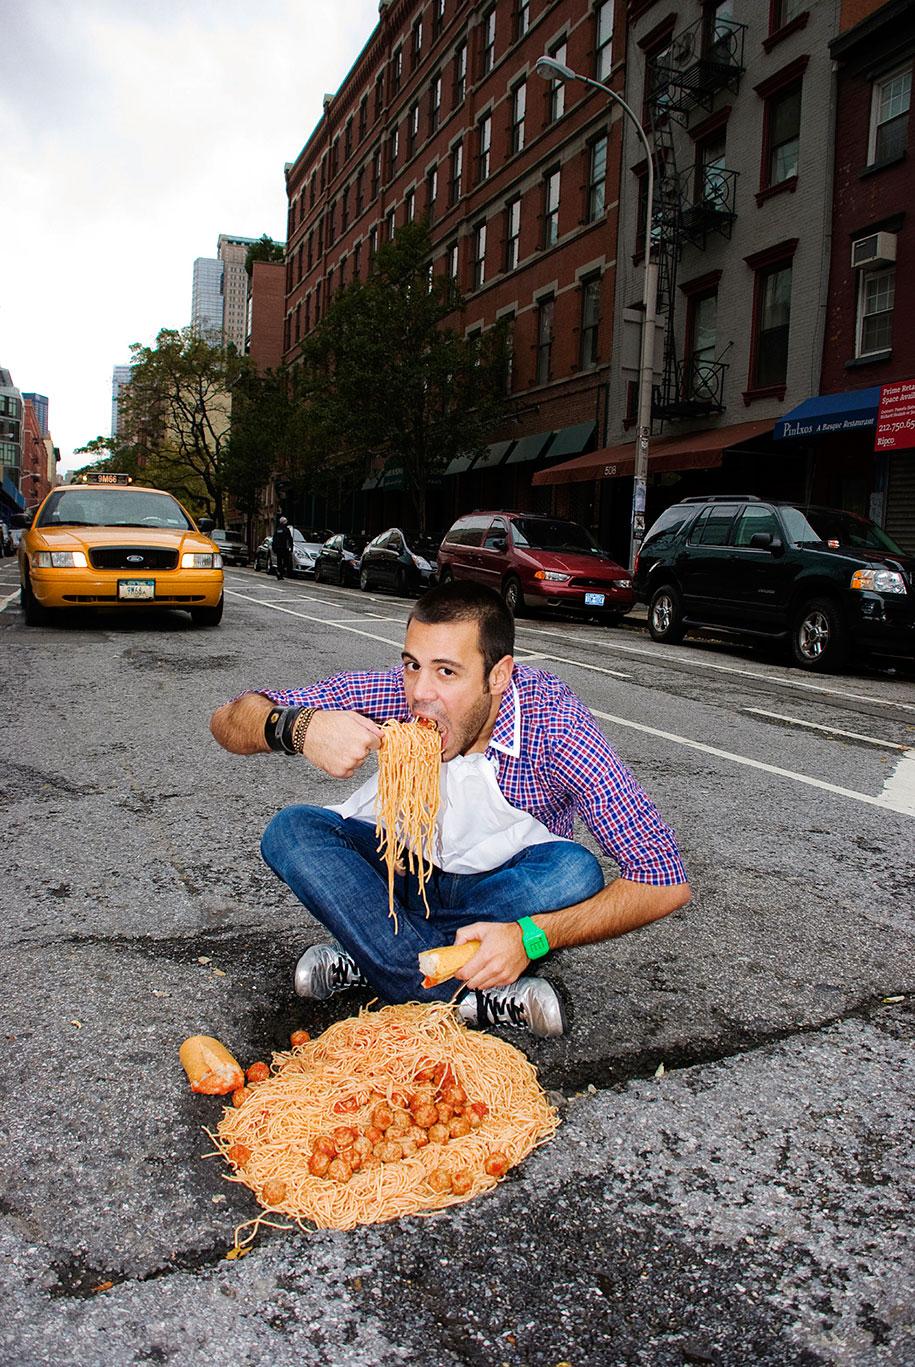 Annoying City Potholes Turned Into Imaginative Scenes